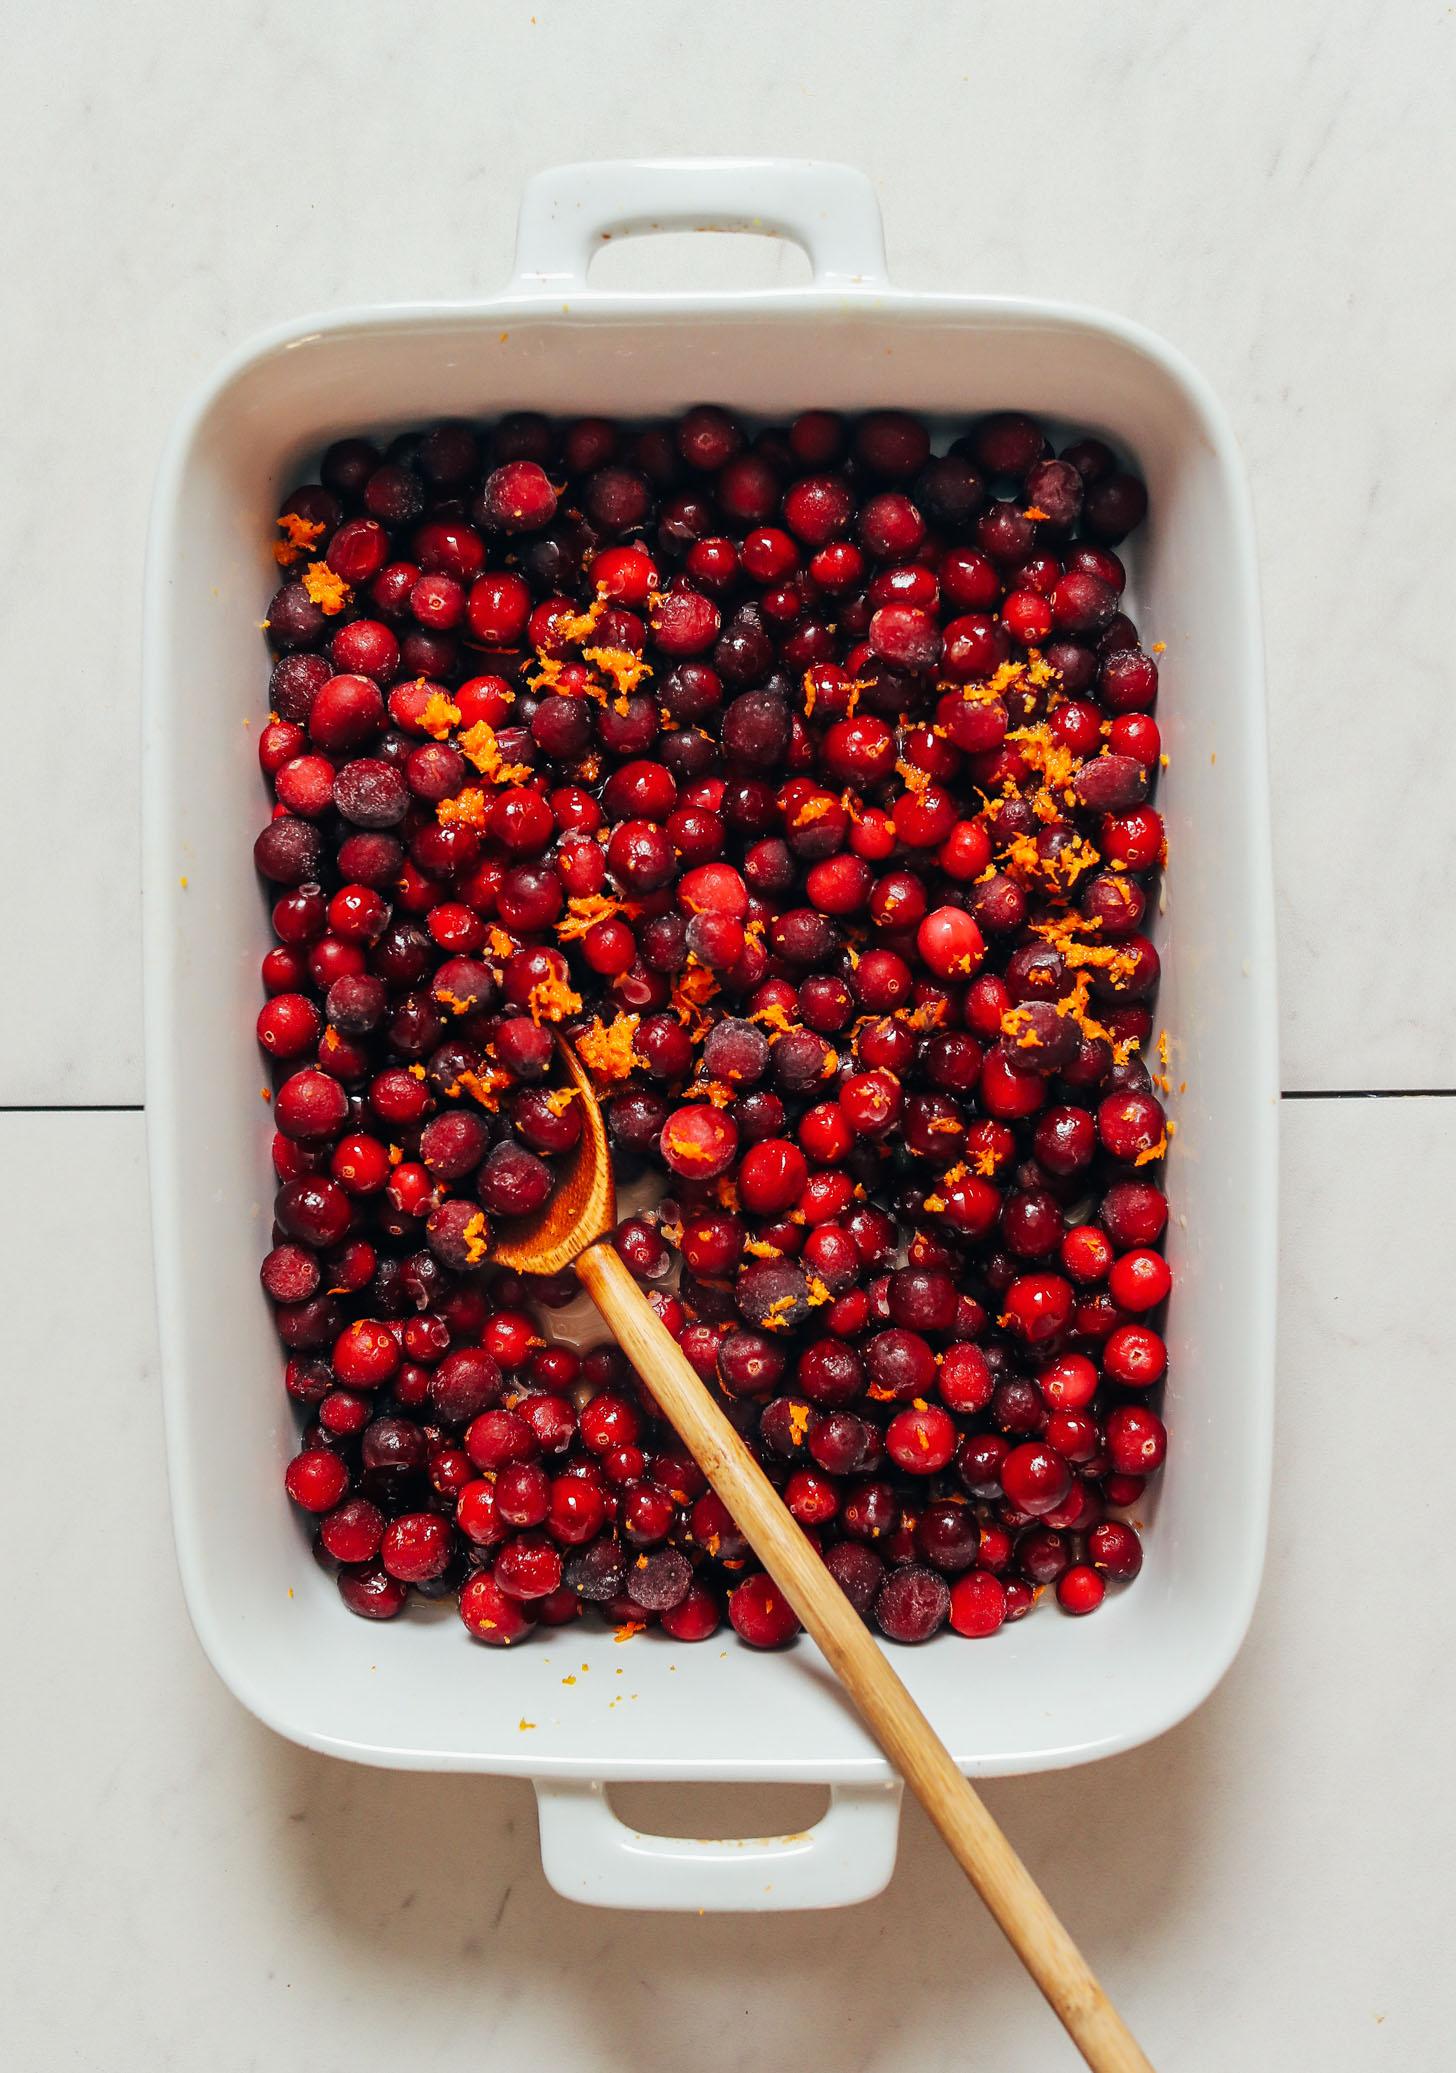 Baking dish of cranberries and orange zest